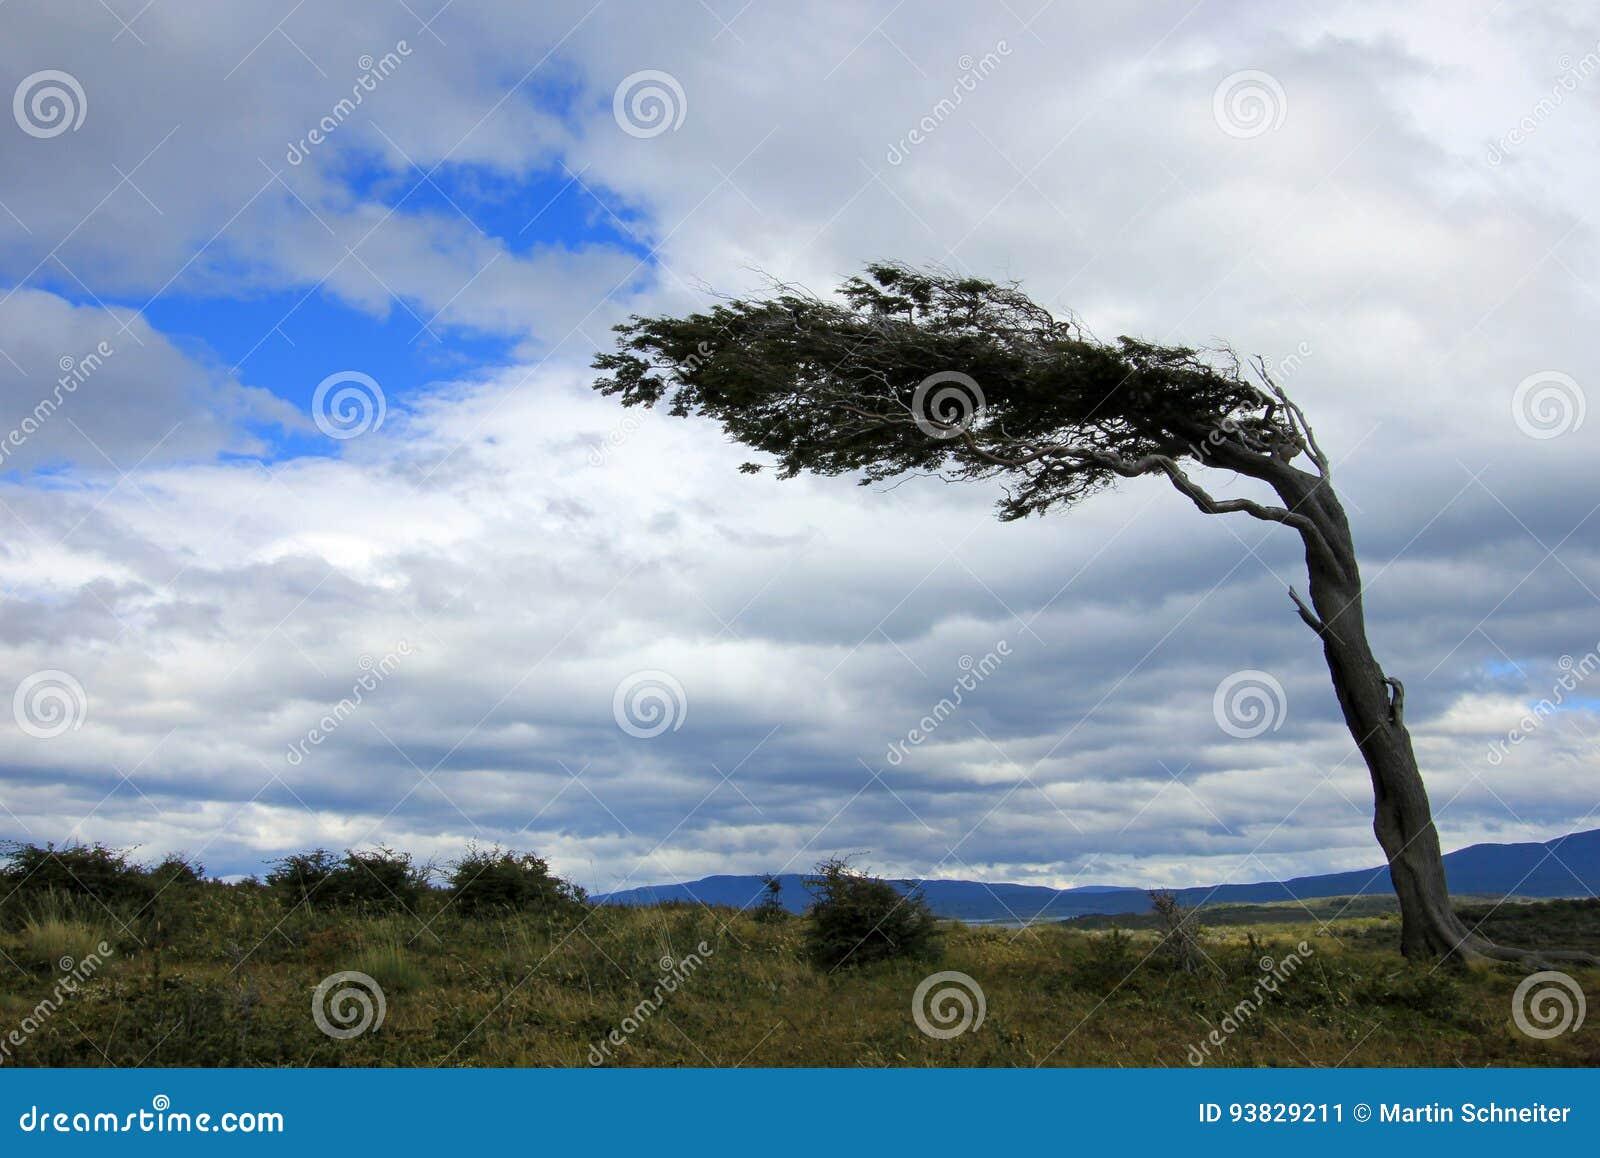 Boom Door Wind Patagonie Argentinie Wordt Misvormd Dat Stock Afbeelding Afbeelding Bestaande Uit Patagonie Door 93829211